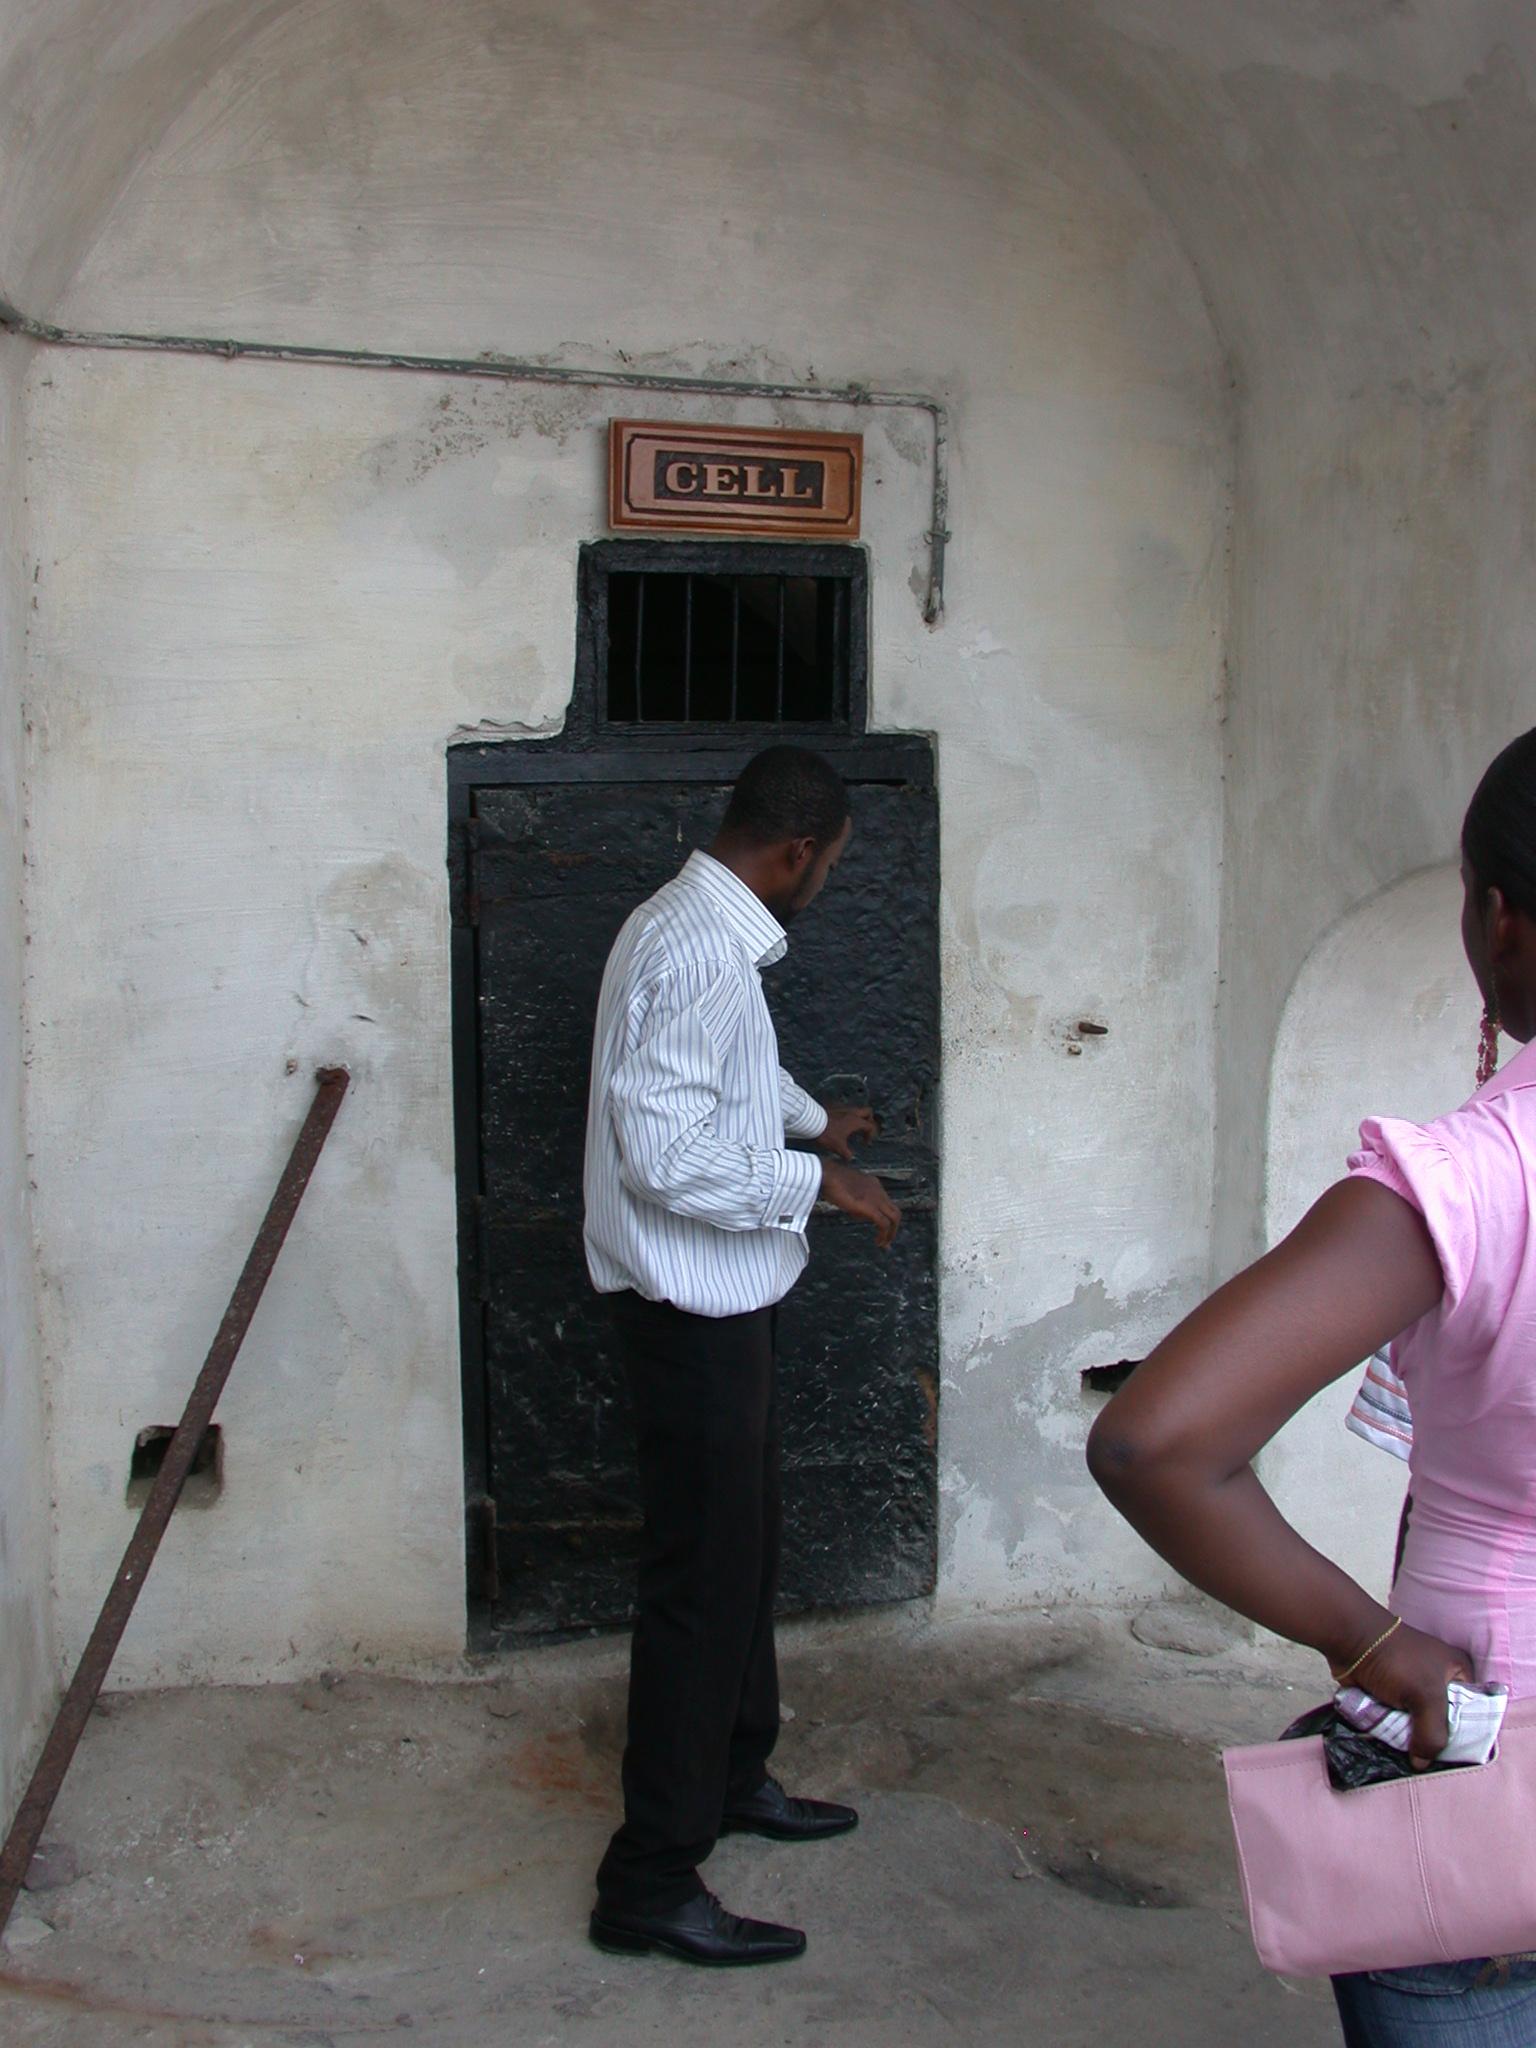 Cell, Cape Coast Slave Fort, Cape Coast, Ghana